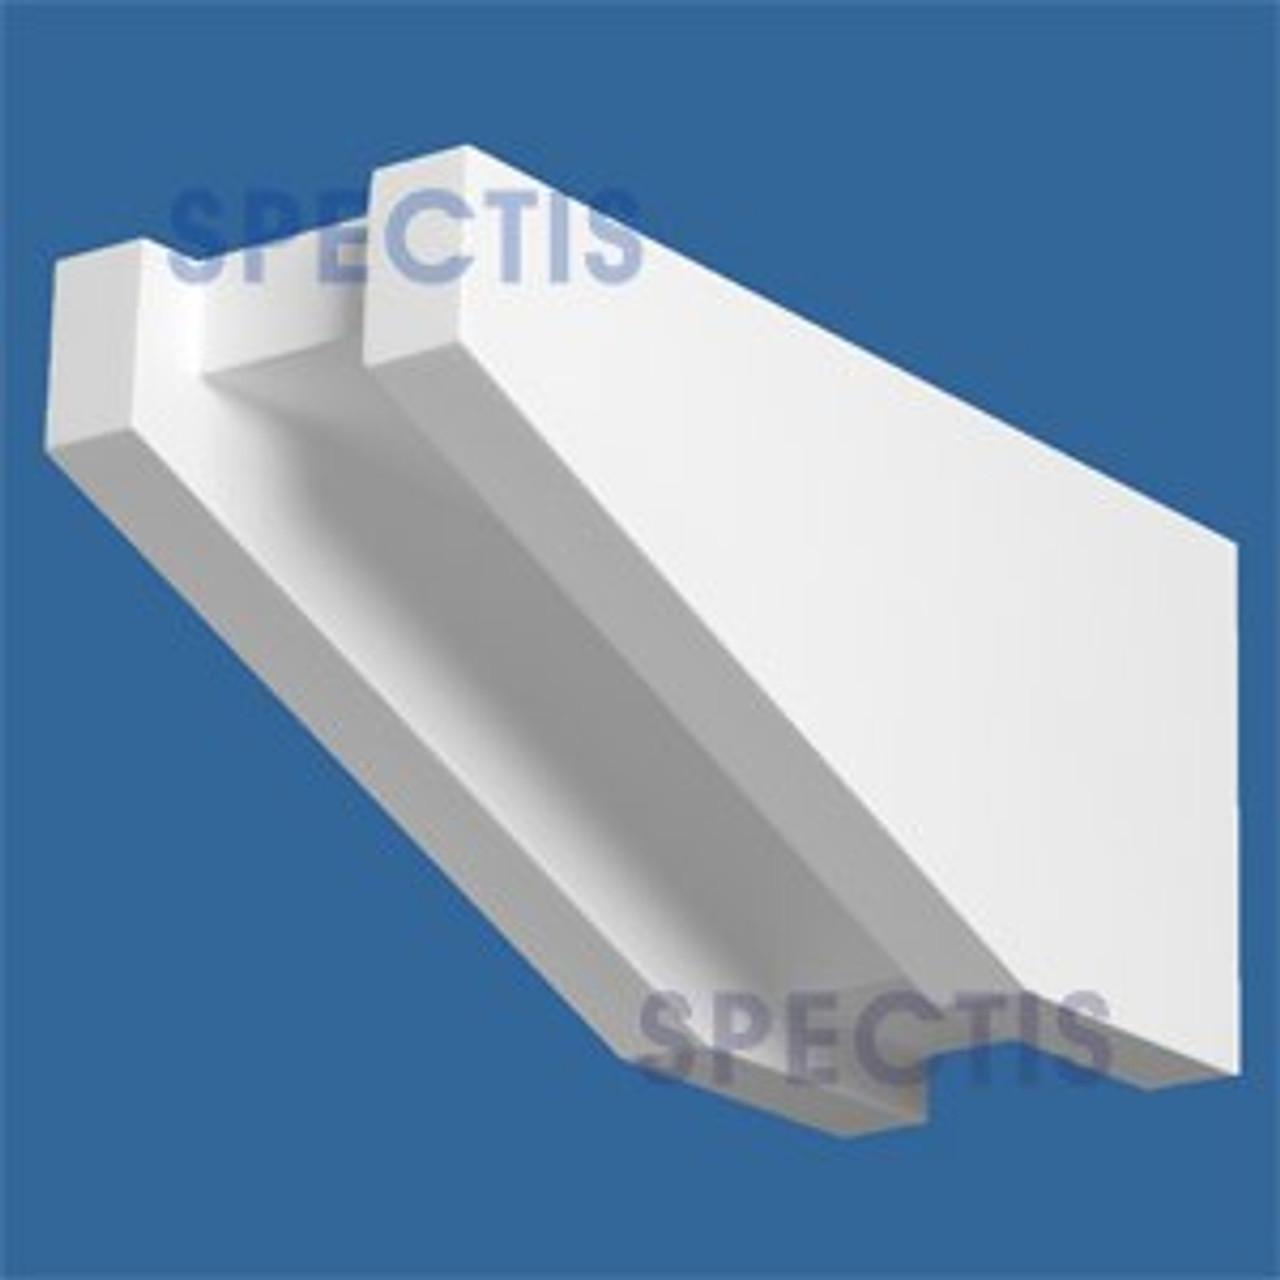 "BL2779 Corbel Block or Eave Bracket 6.5""W x 7.5""H x 16.5"" P"